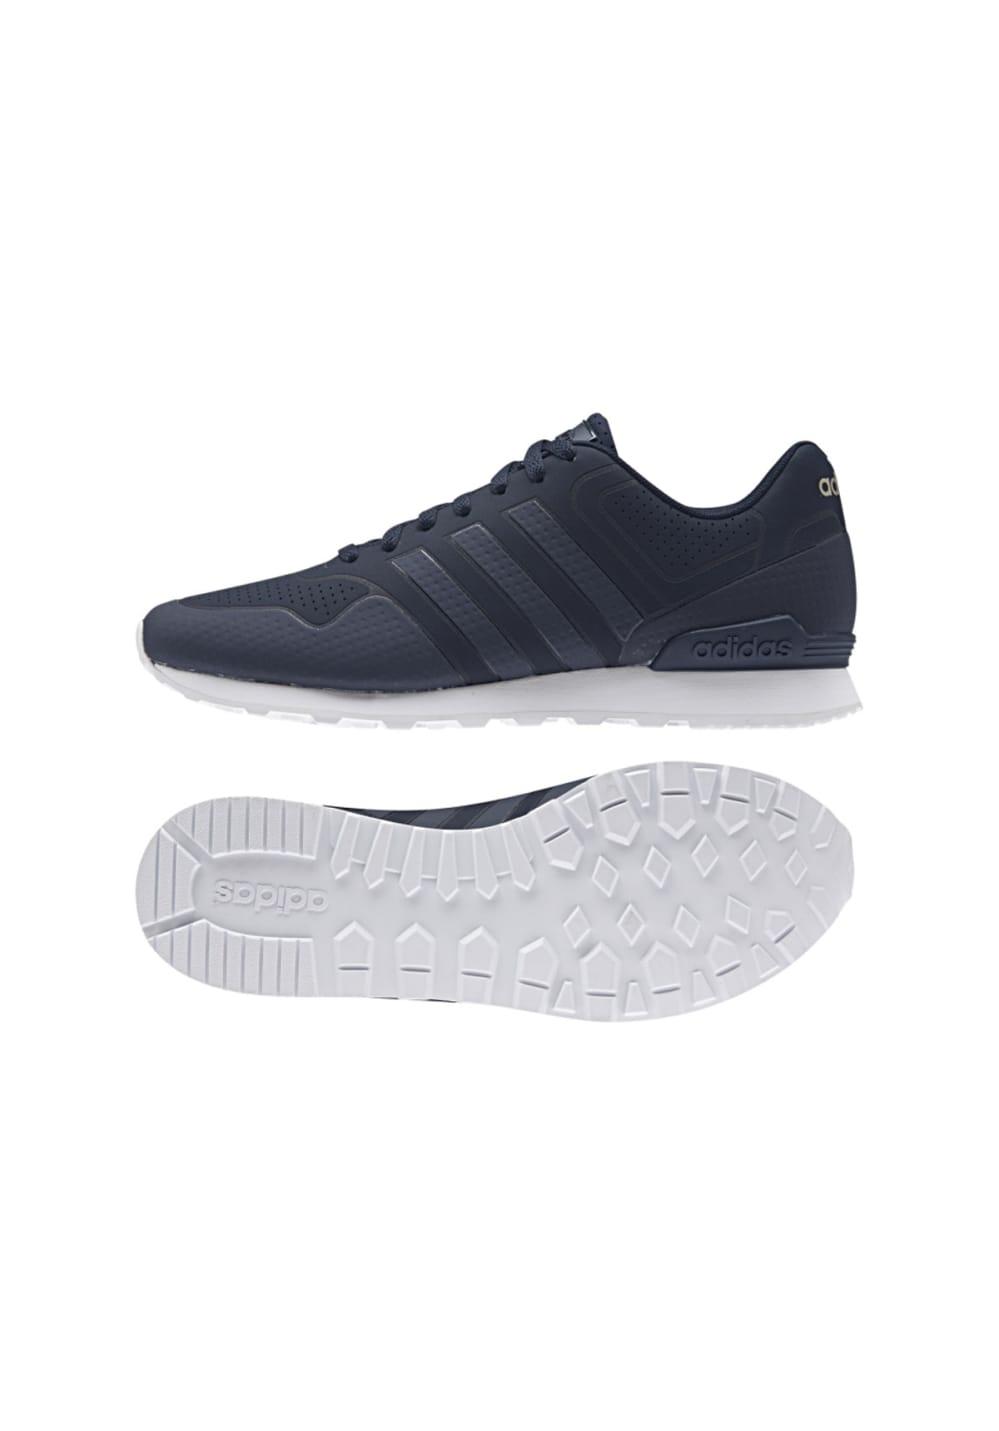 adidas 10K Casual Sneaker - Sneaker für Herren - Blau